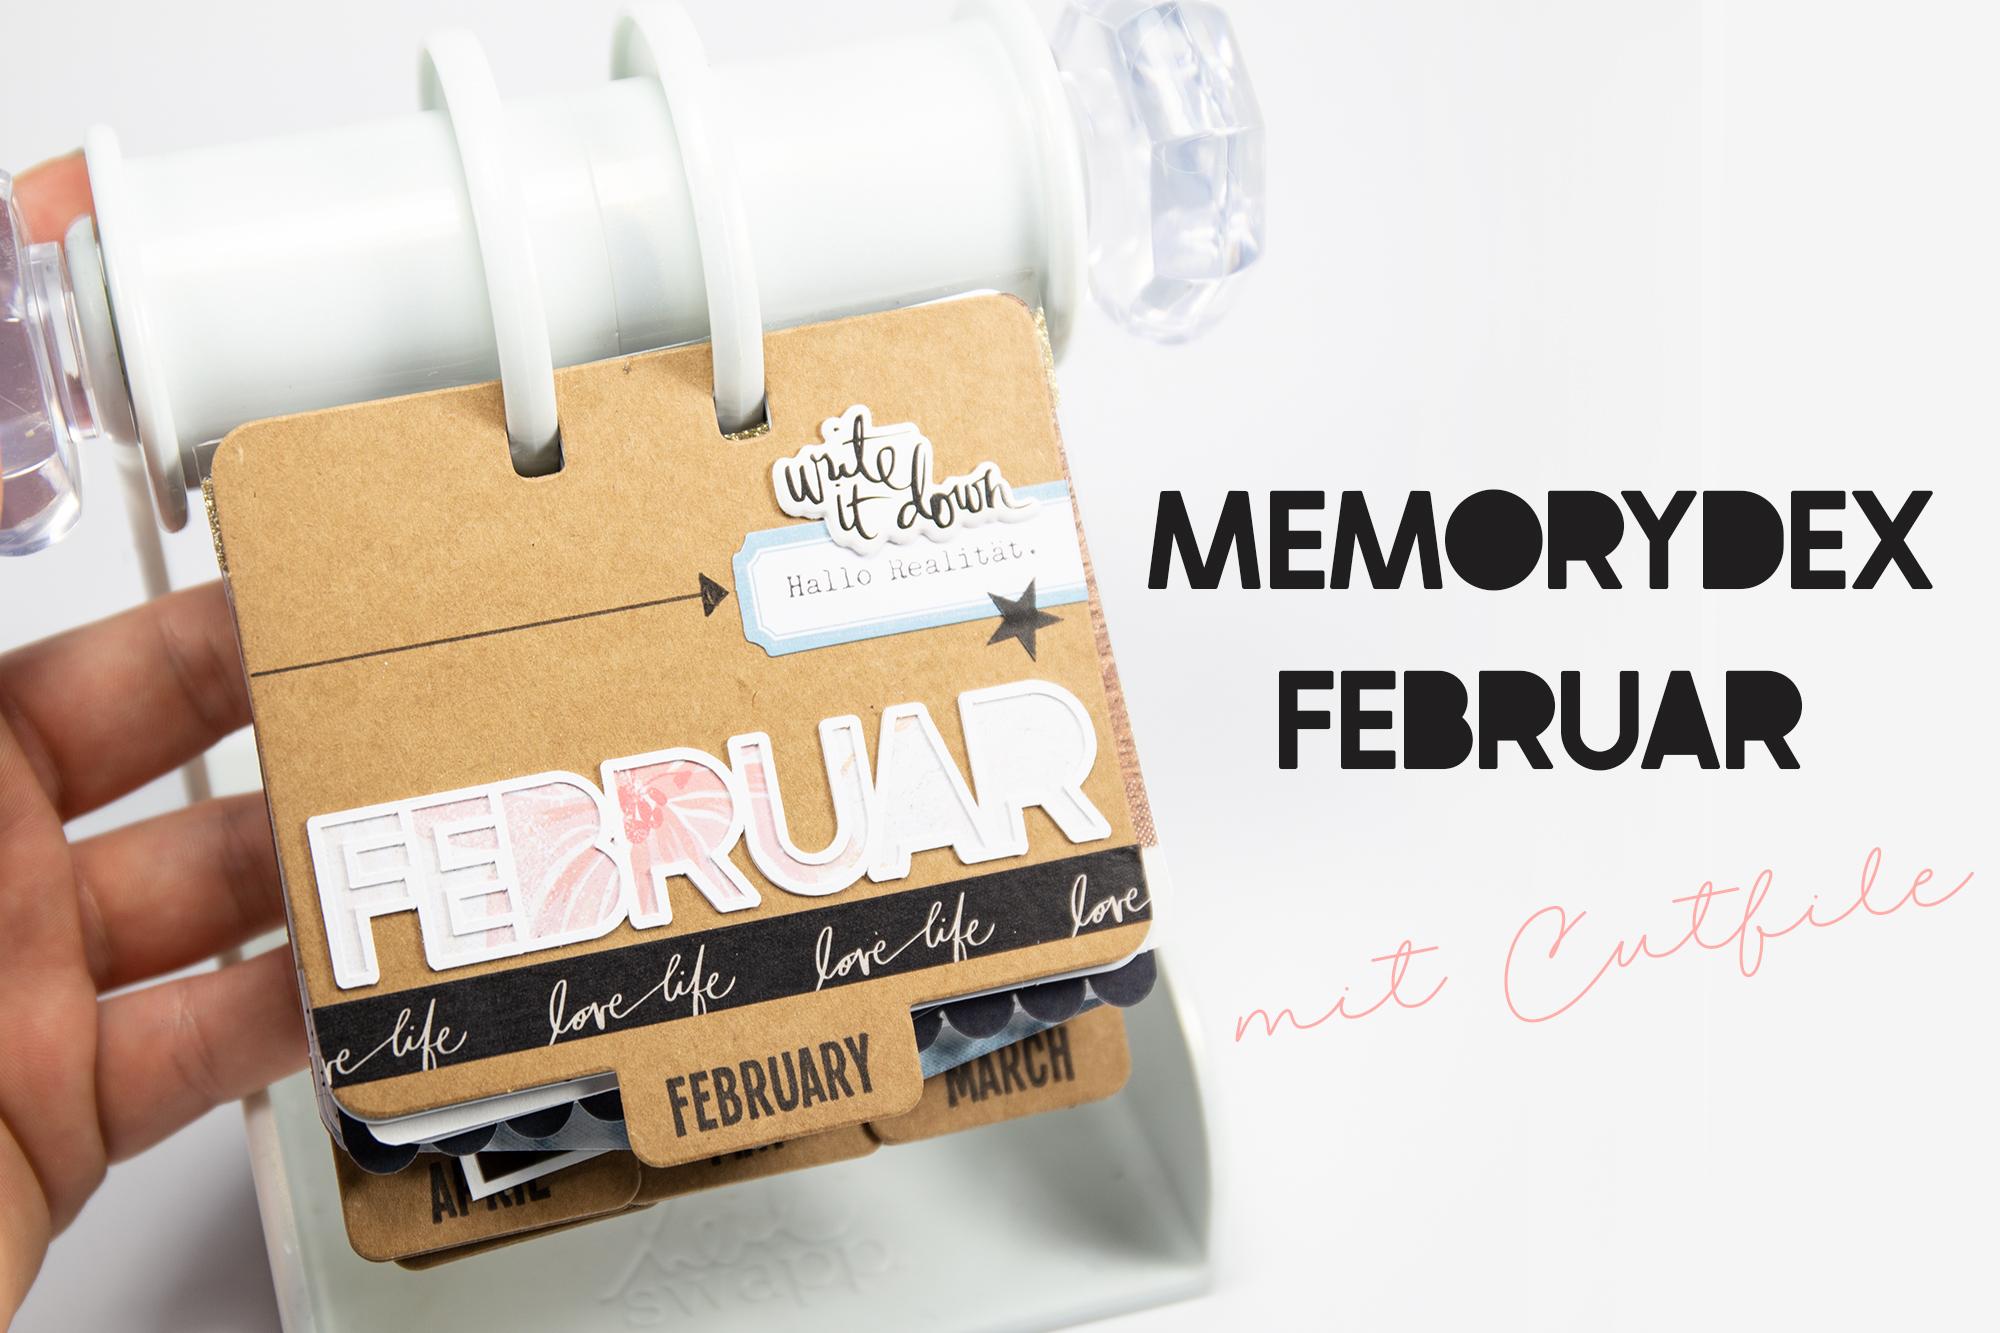 Memorydex Februar